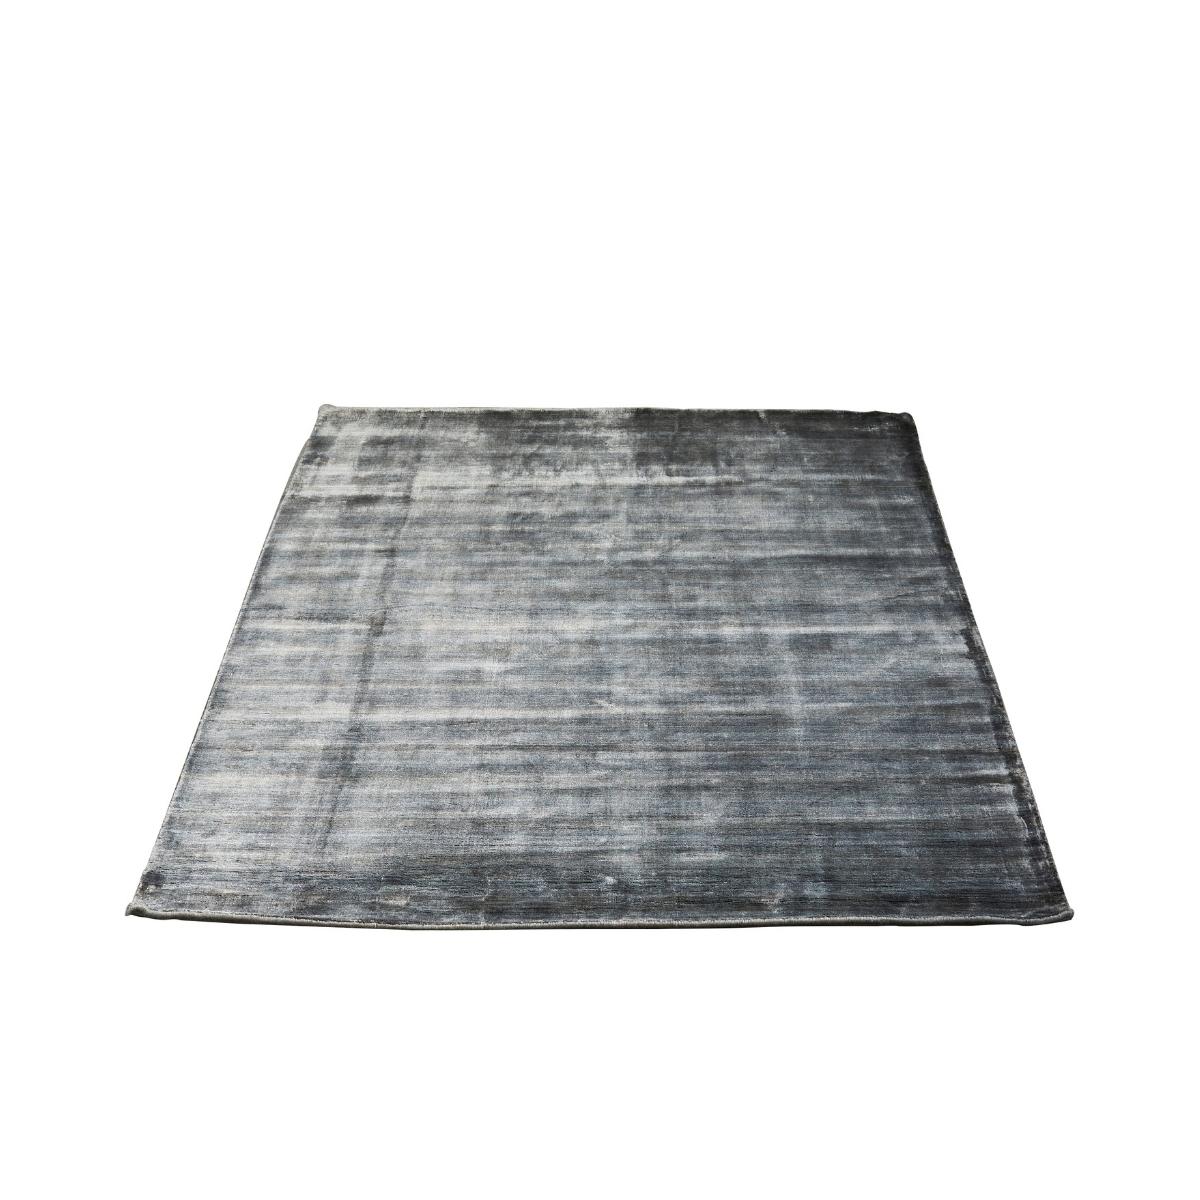 Massimo | Bamboo - Grey - Bolighuset Werenberg